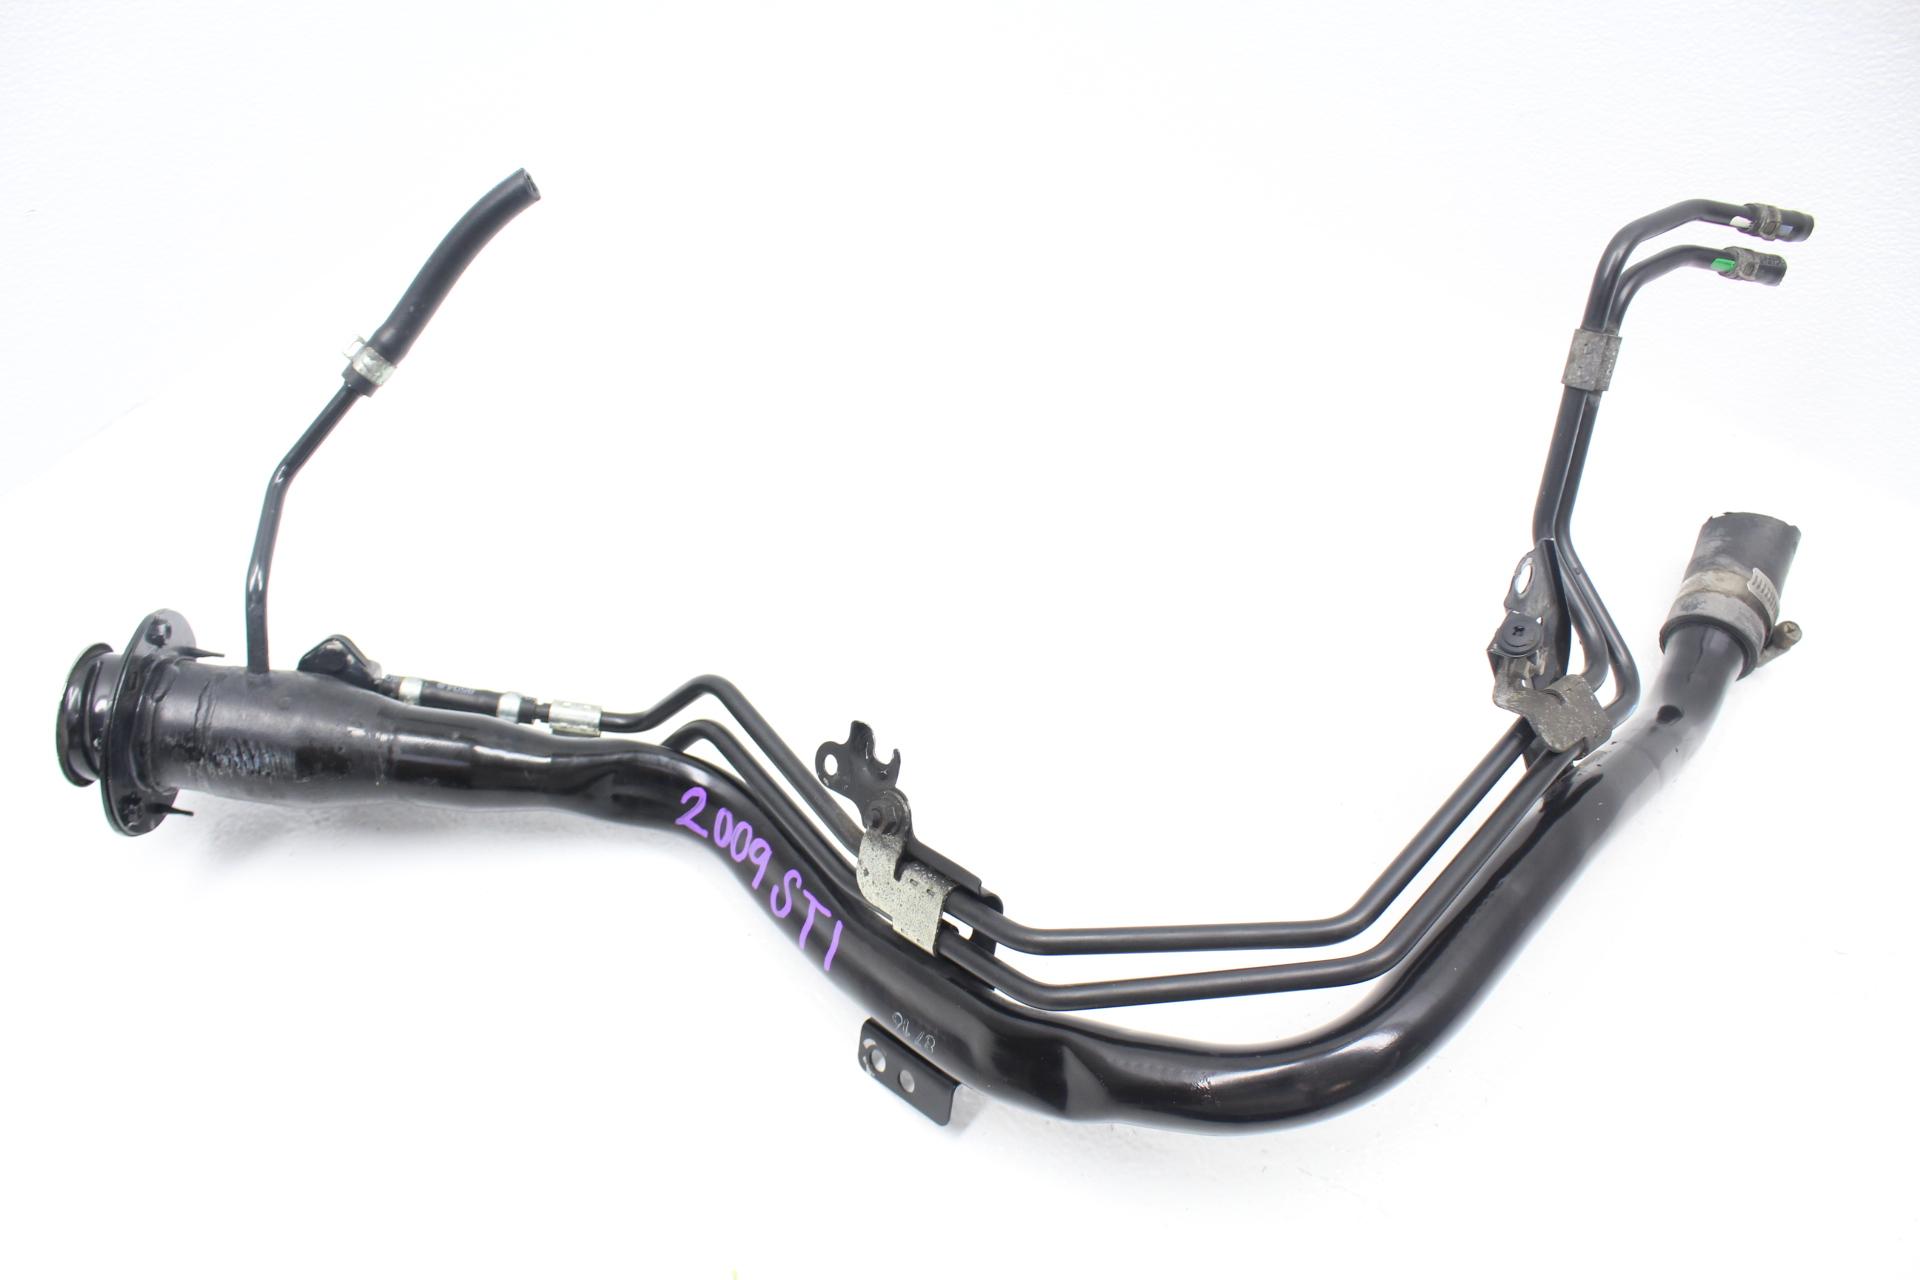 Subaru Impreza Wrx Amp Sti Fuel Filler Neck Tube